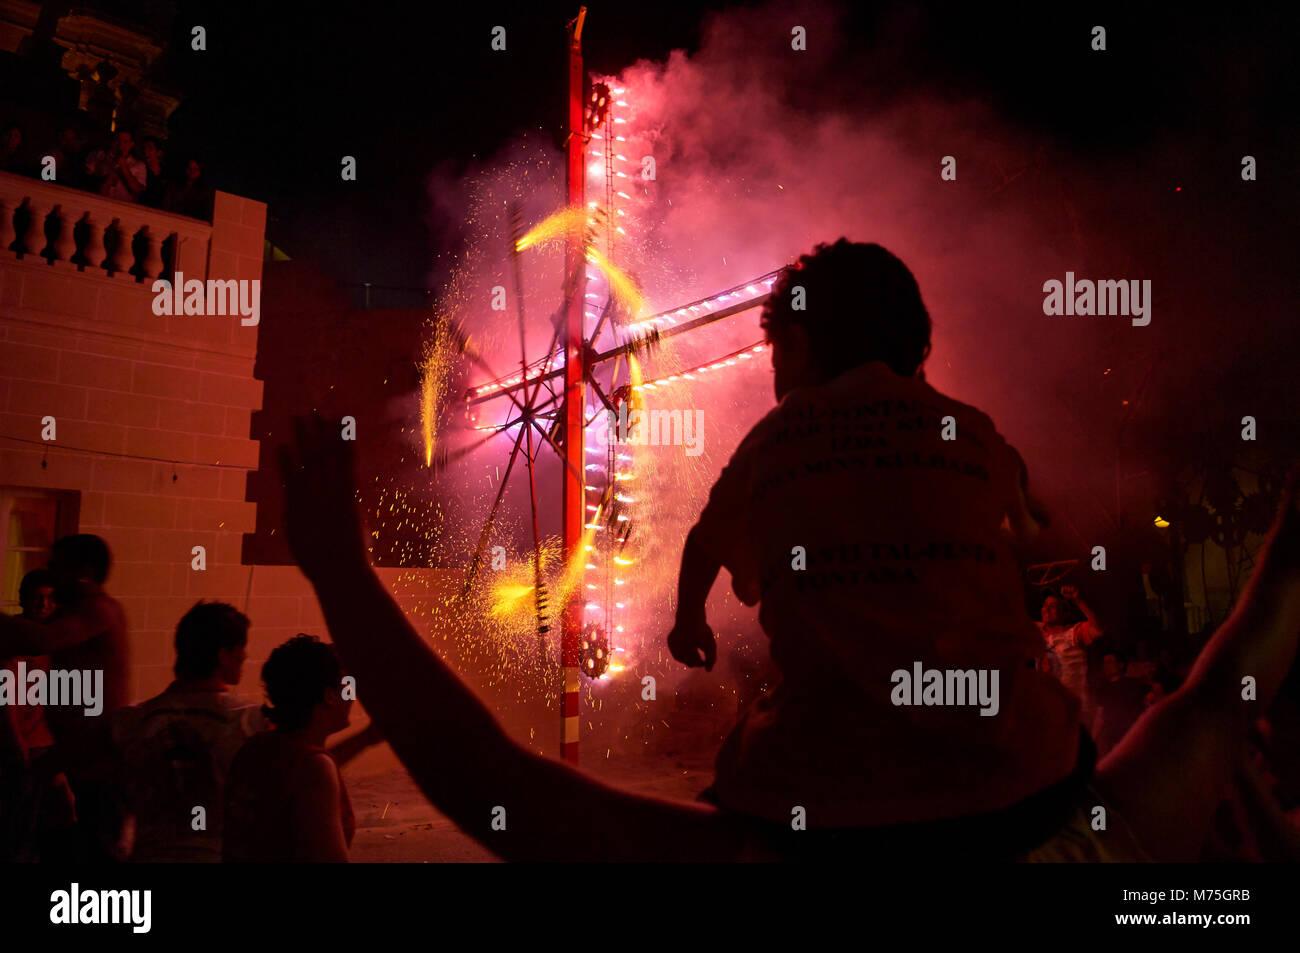 Feuerwerk feiern, das Fest des Heiligen Herzen Jesu Festa. Fontana, Insel Gozo, Malta Stockbild